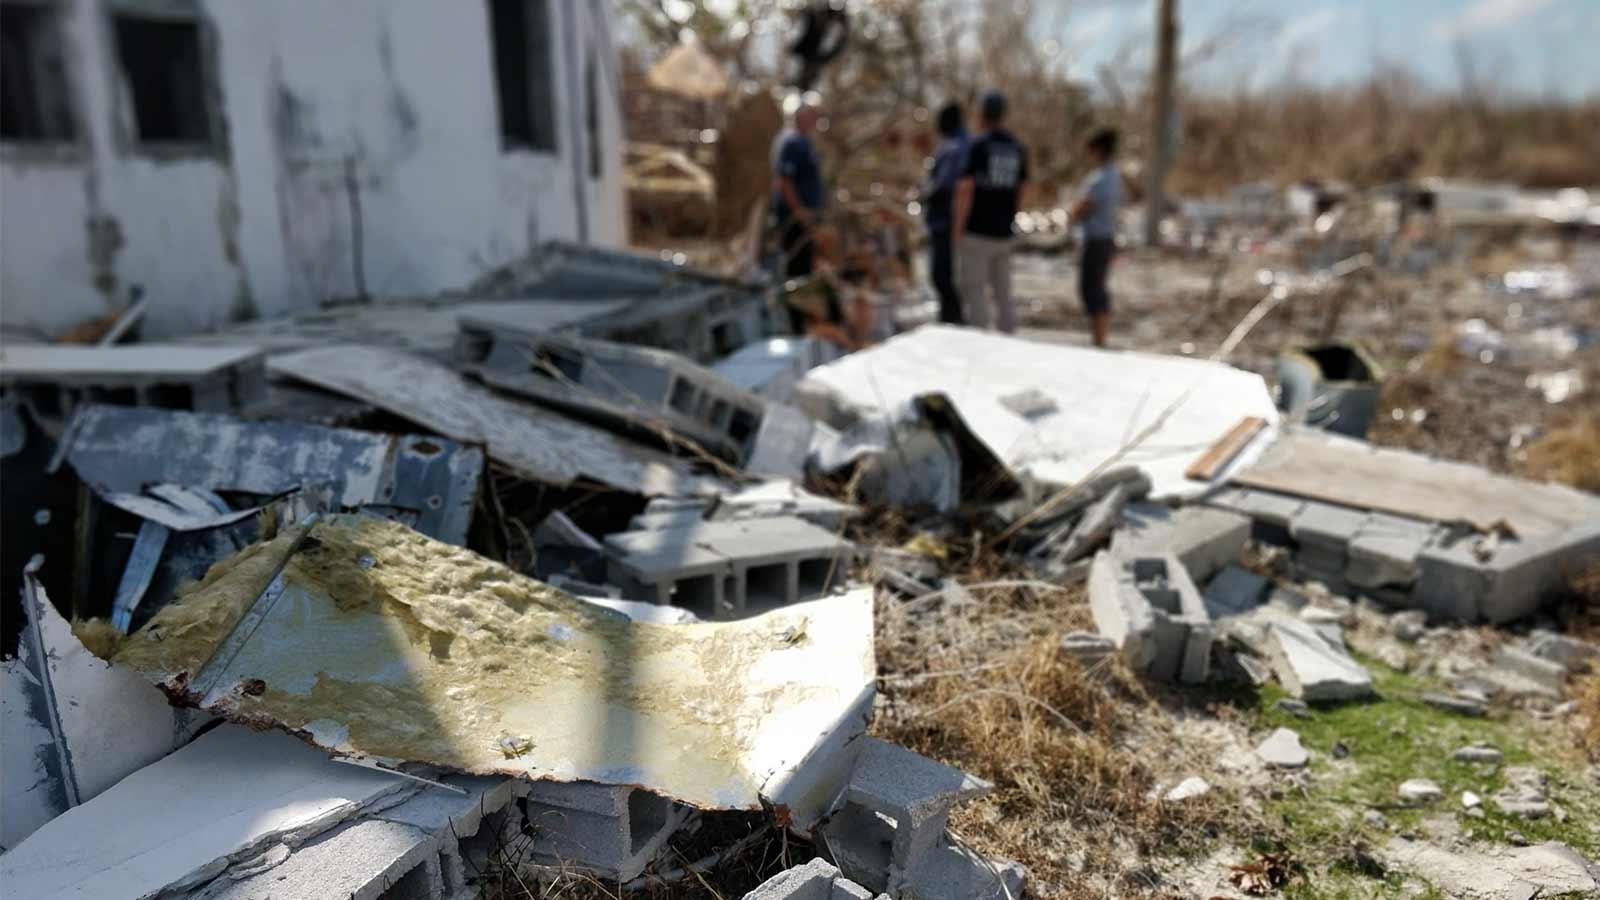 The-GlobalMedic-team-respond-after-a-hurricane